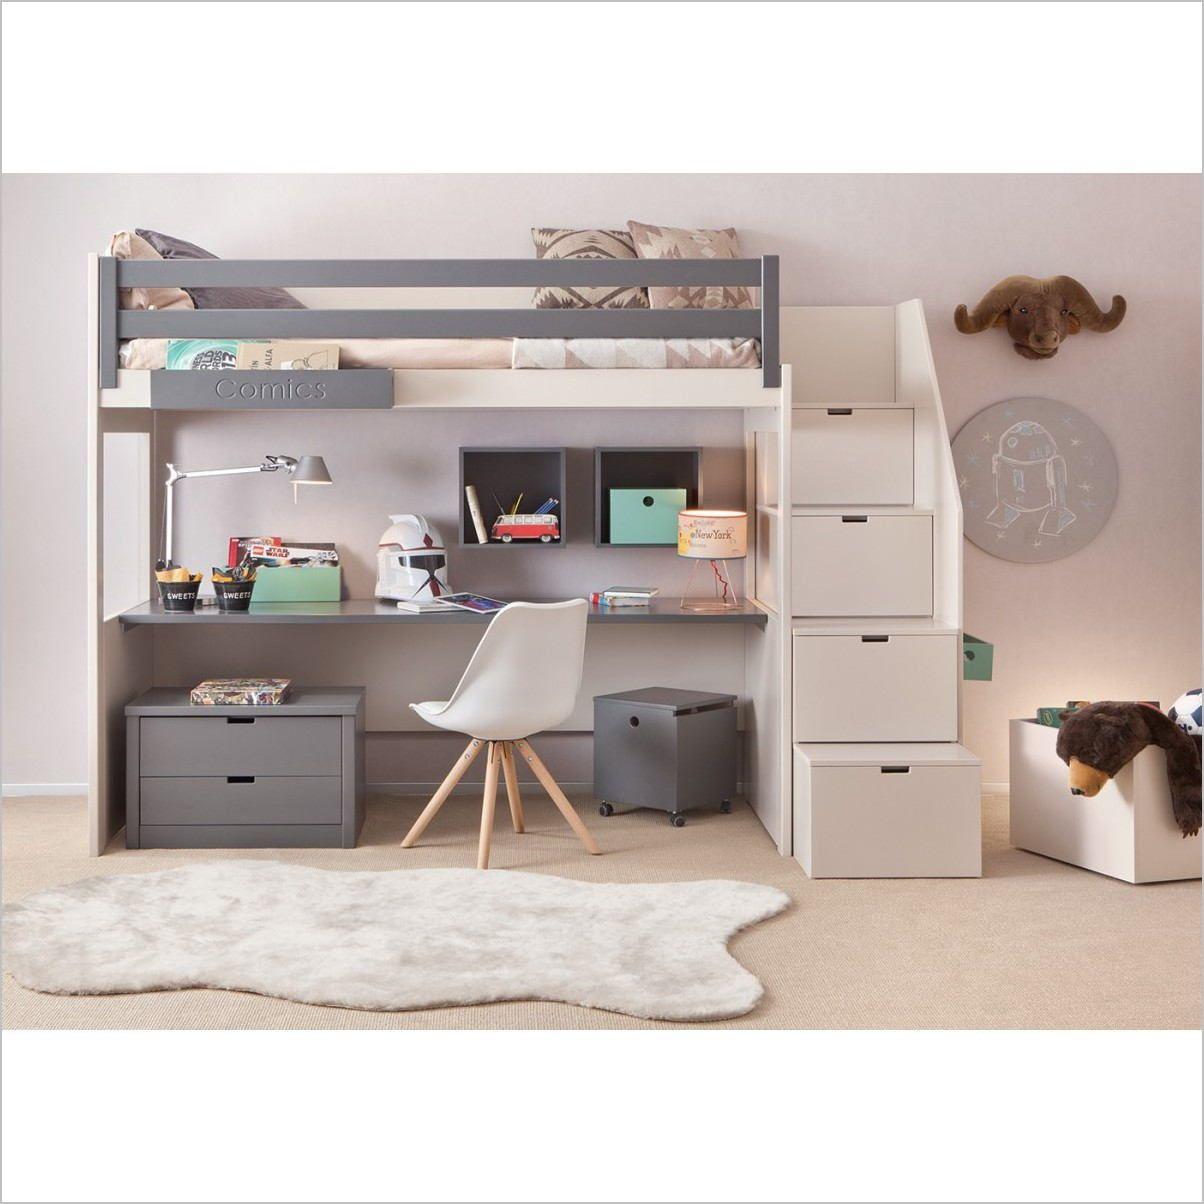 Chambre Enfant Lit Mezzanine Deco Prune In 2020 Loft Bed Living